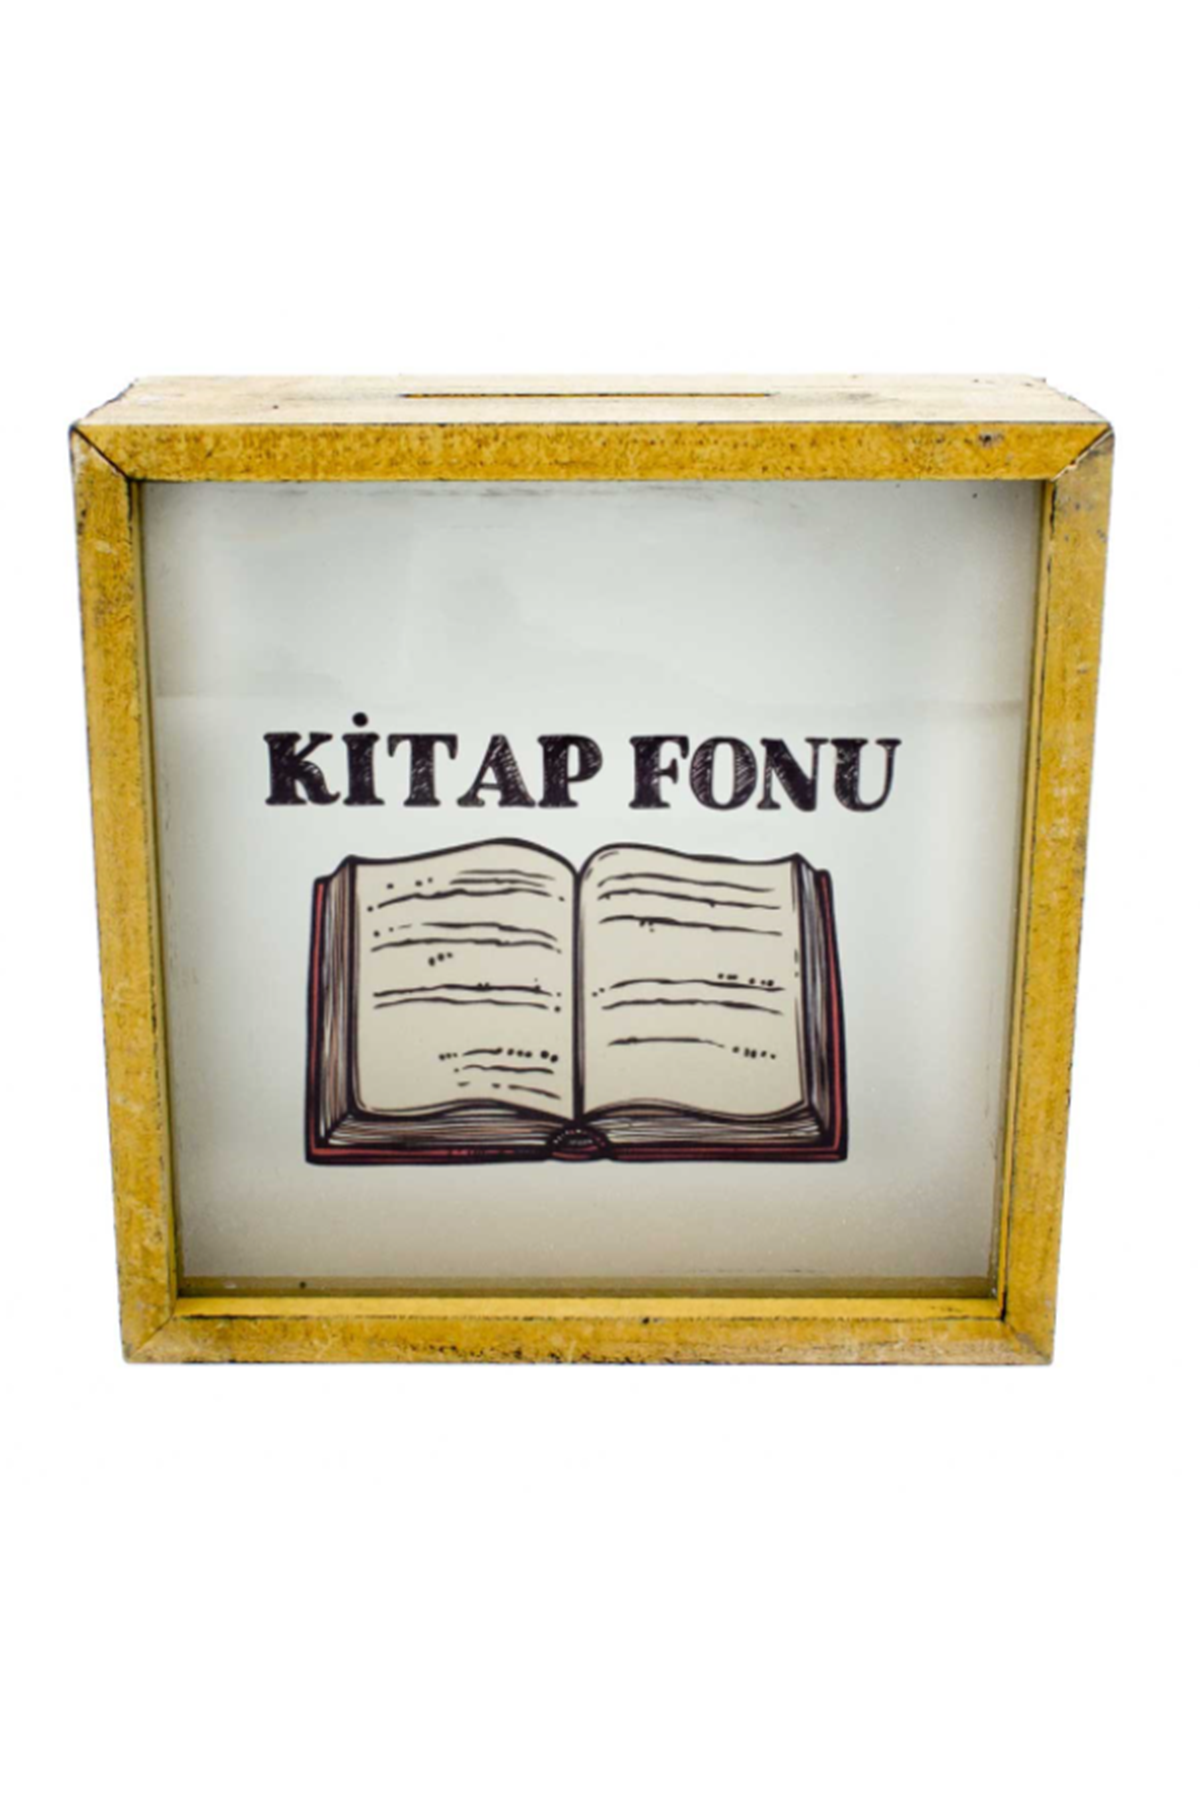 KİTAP FONU SARI -  AHŞAP VE CAM TASARIMLI KUMBARA